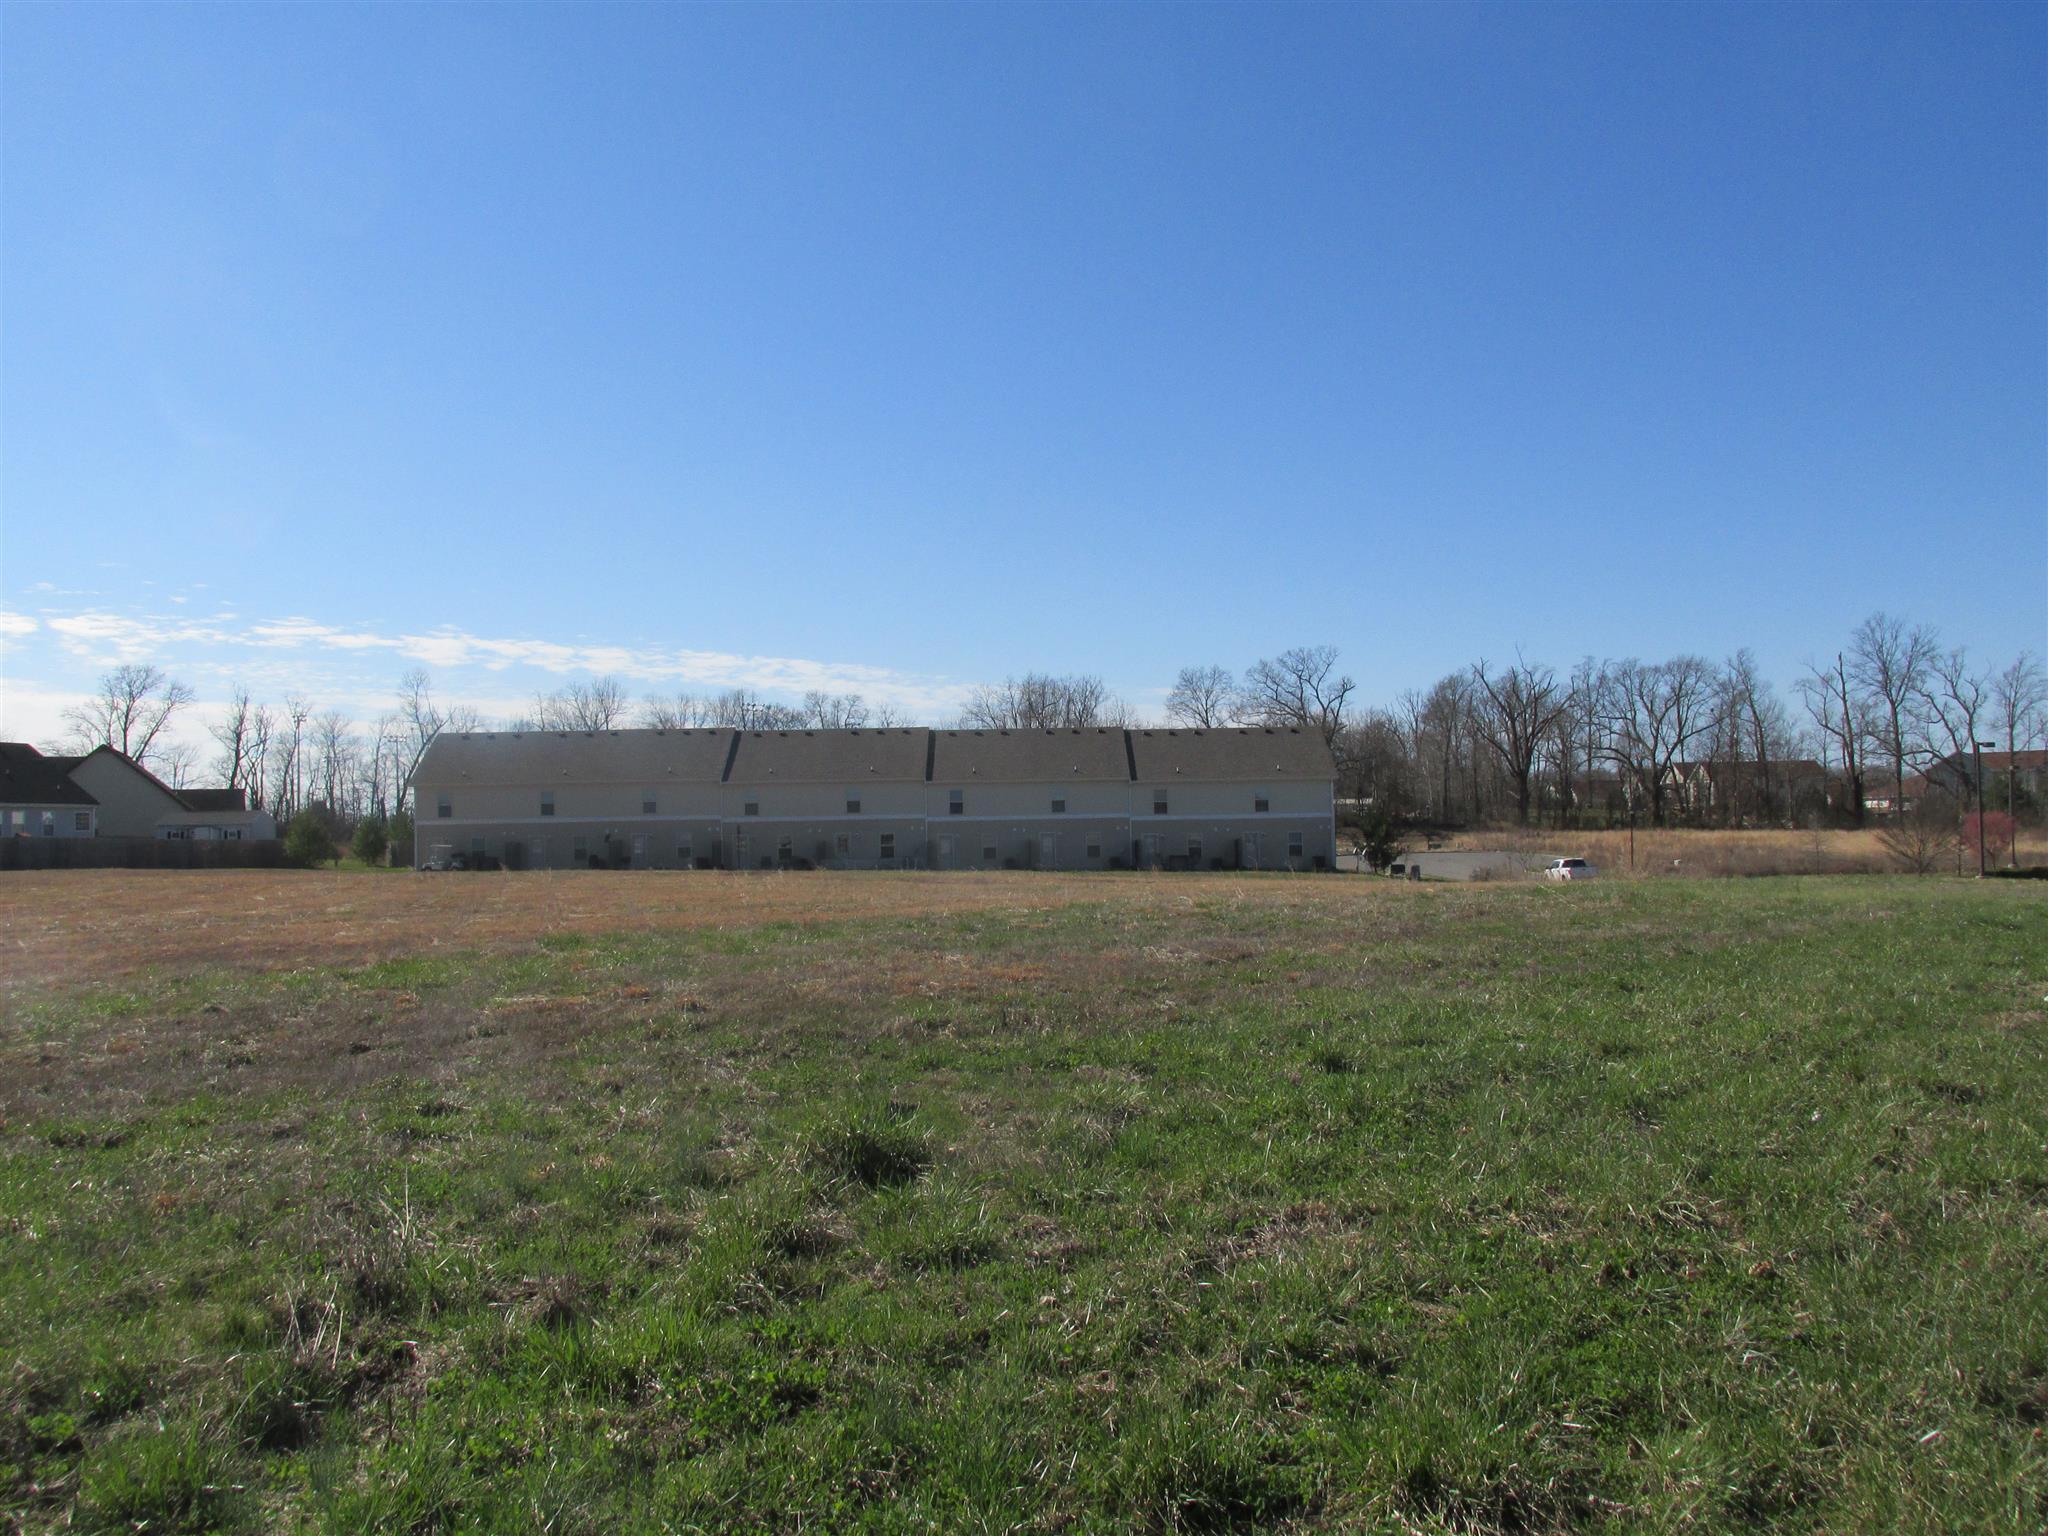 860 Professional Park Dr, Clarksville, TN 37040 - Clarksville, TN real estate listing